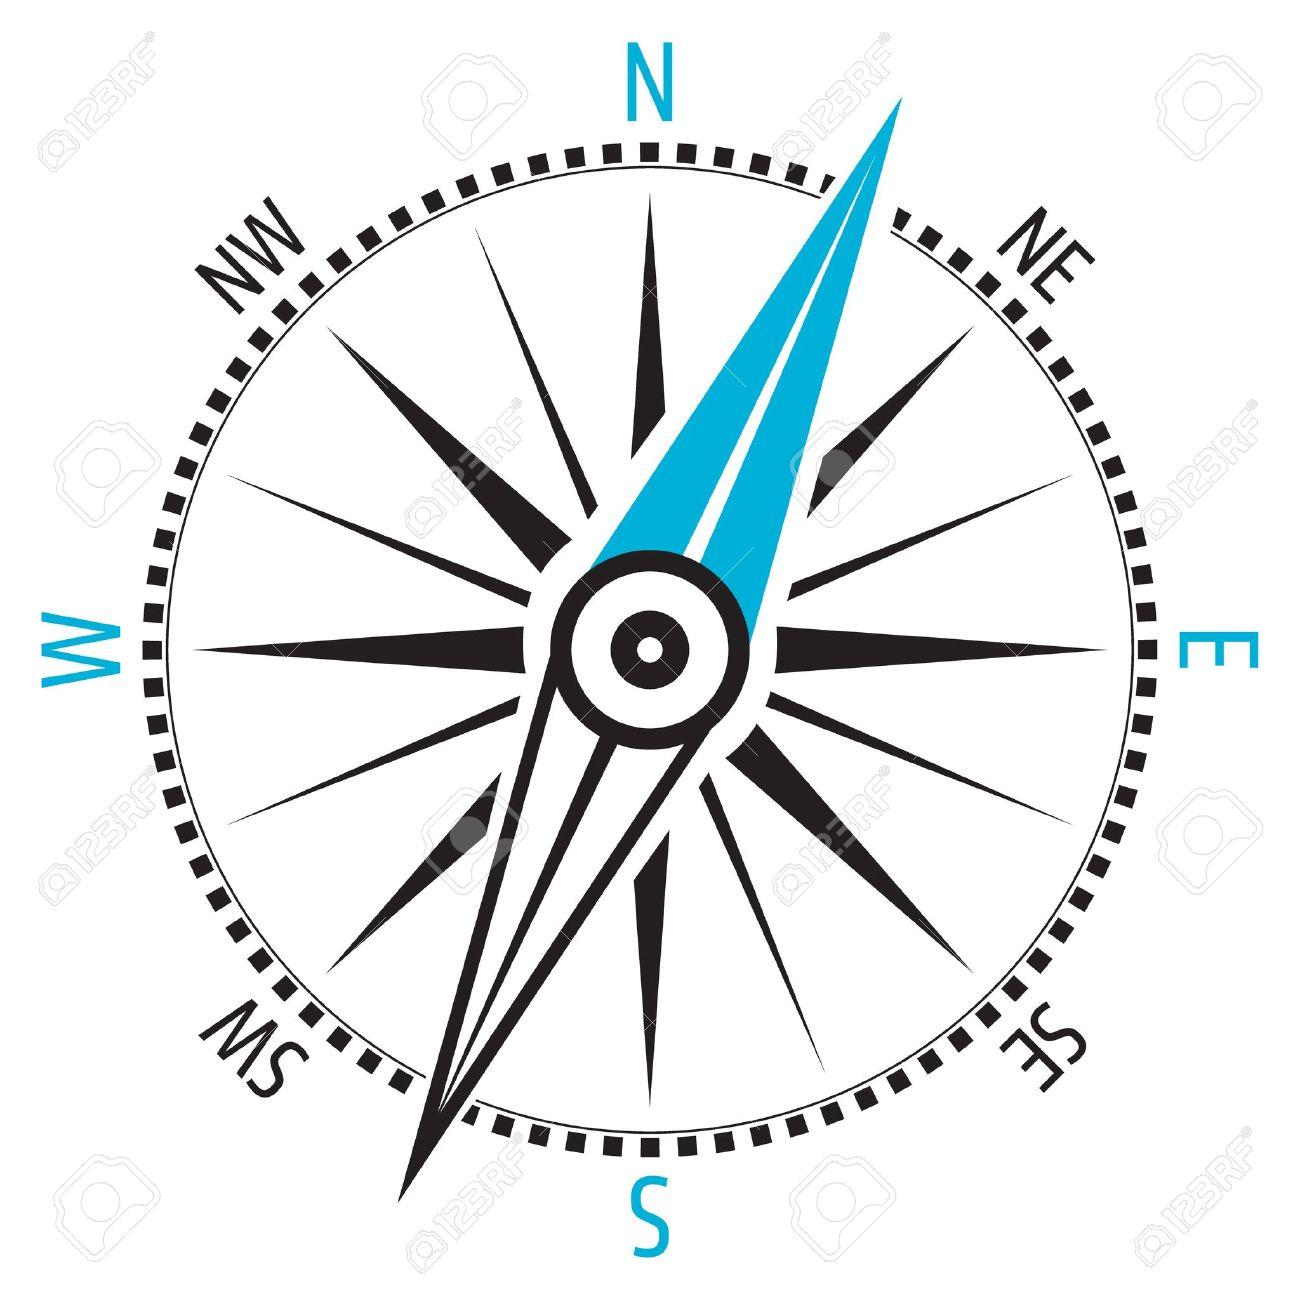 Wind rose, compass - 19841736